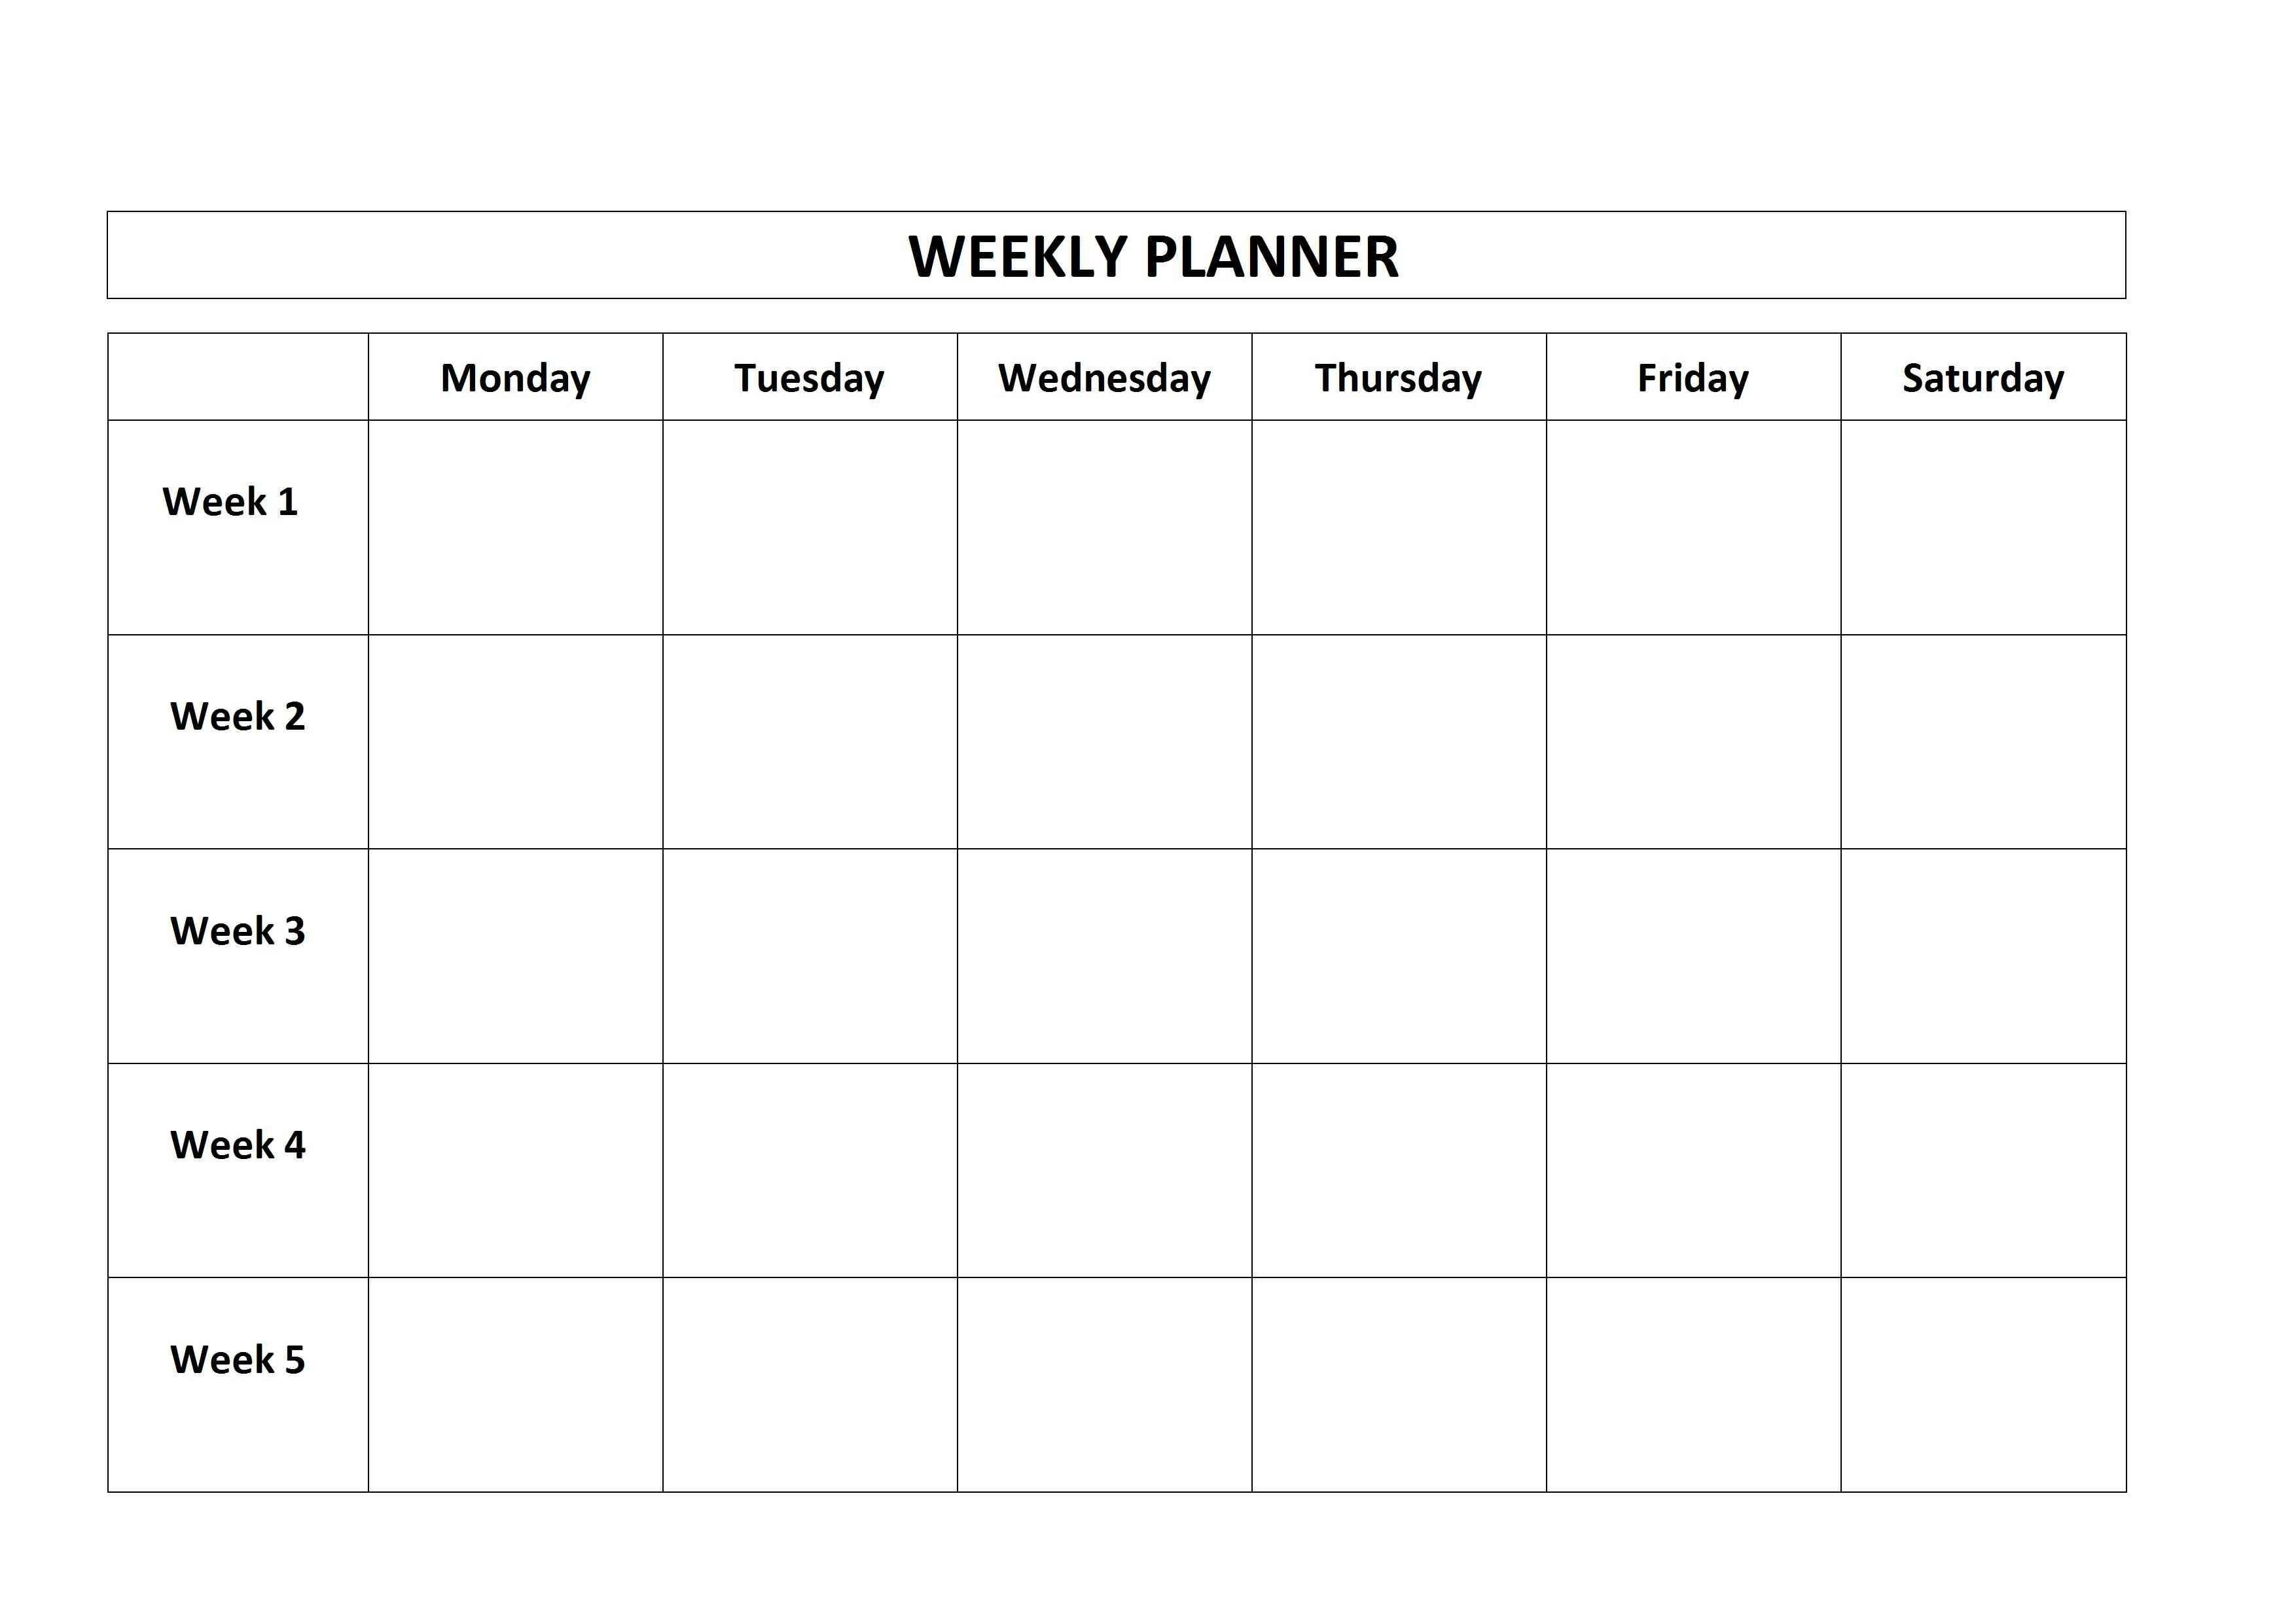 Free Printable Weekly Planner Monday Friday School Calendar Mnday To Friday Calendar Templates